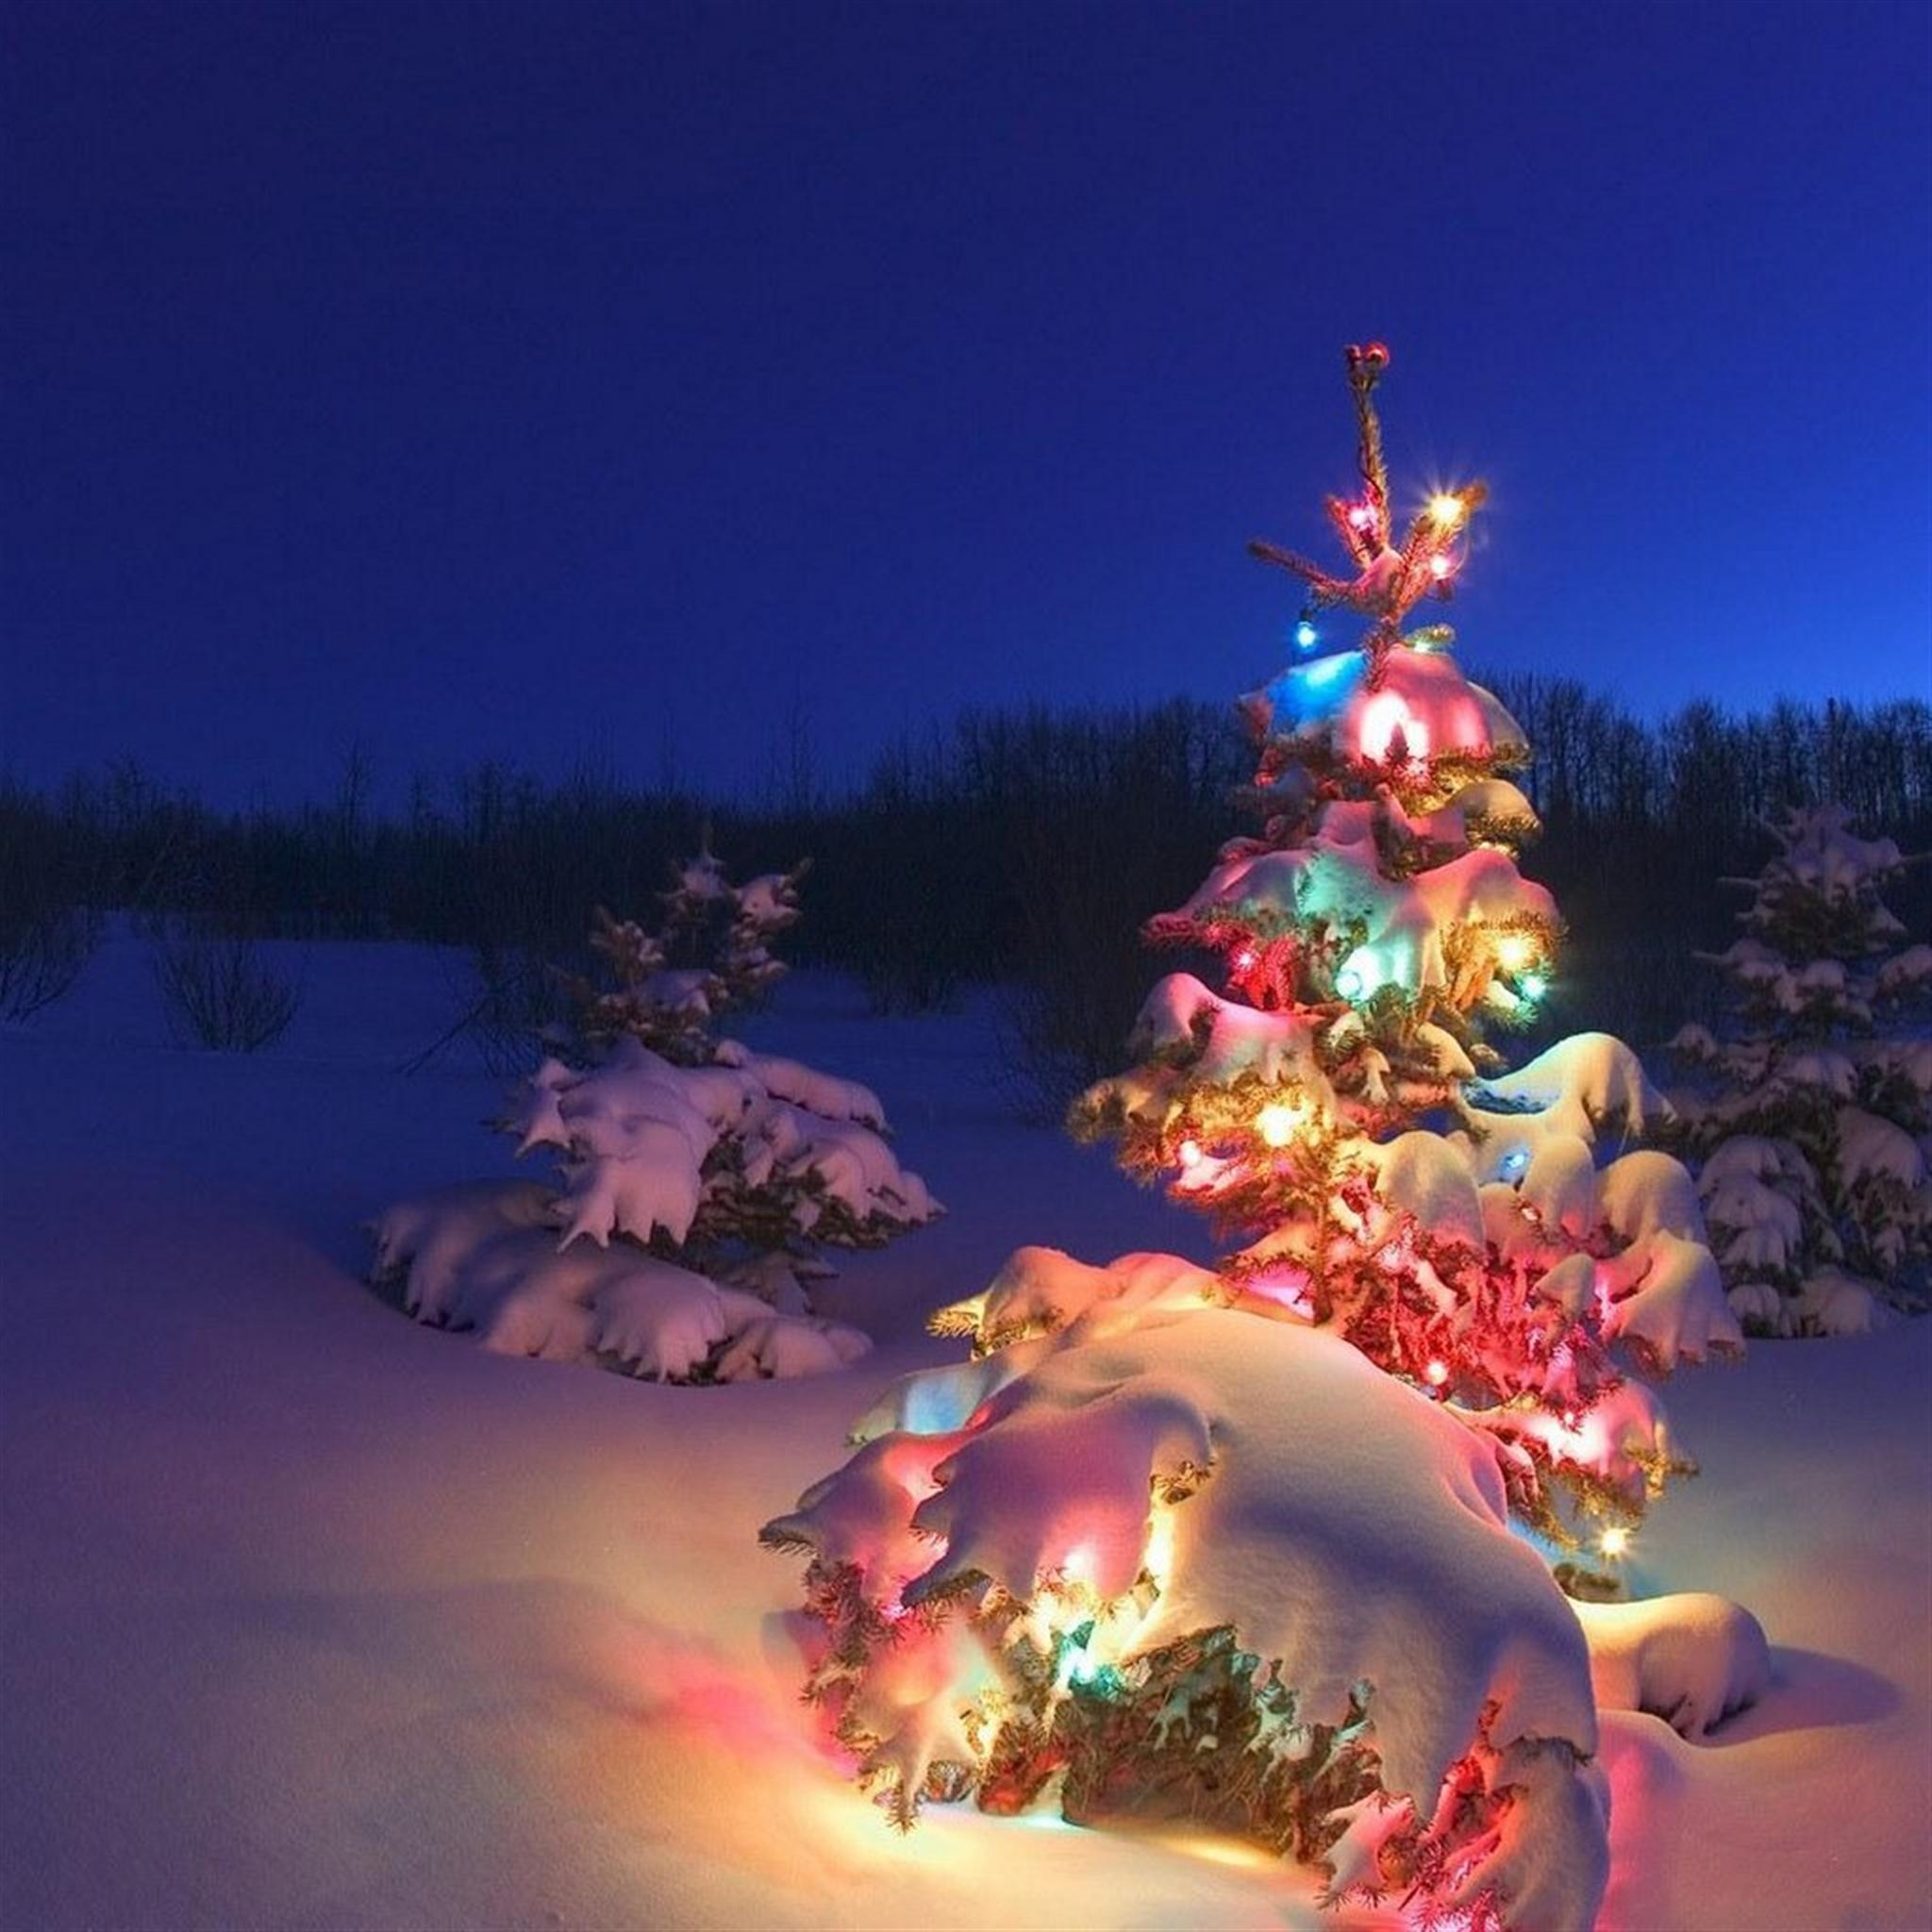 49+] Christmas Wallpaper for iPad Air ...